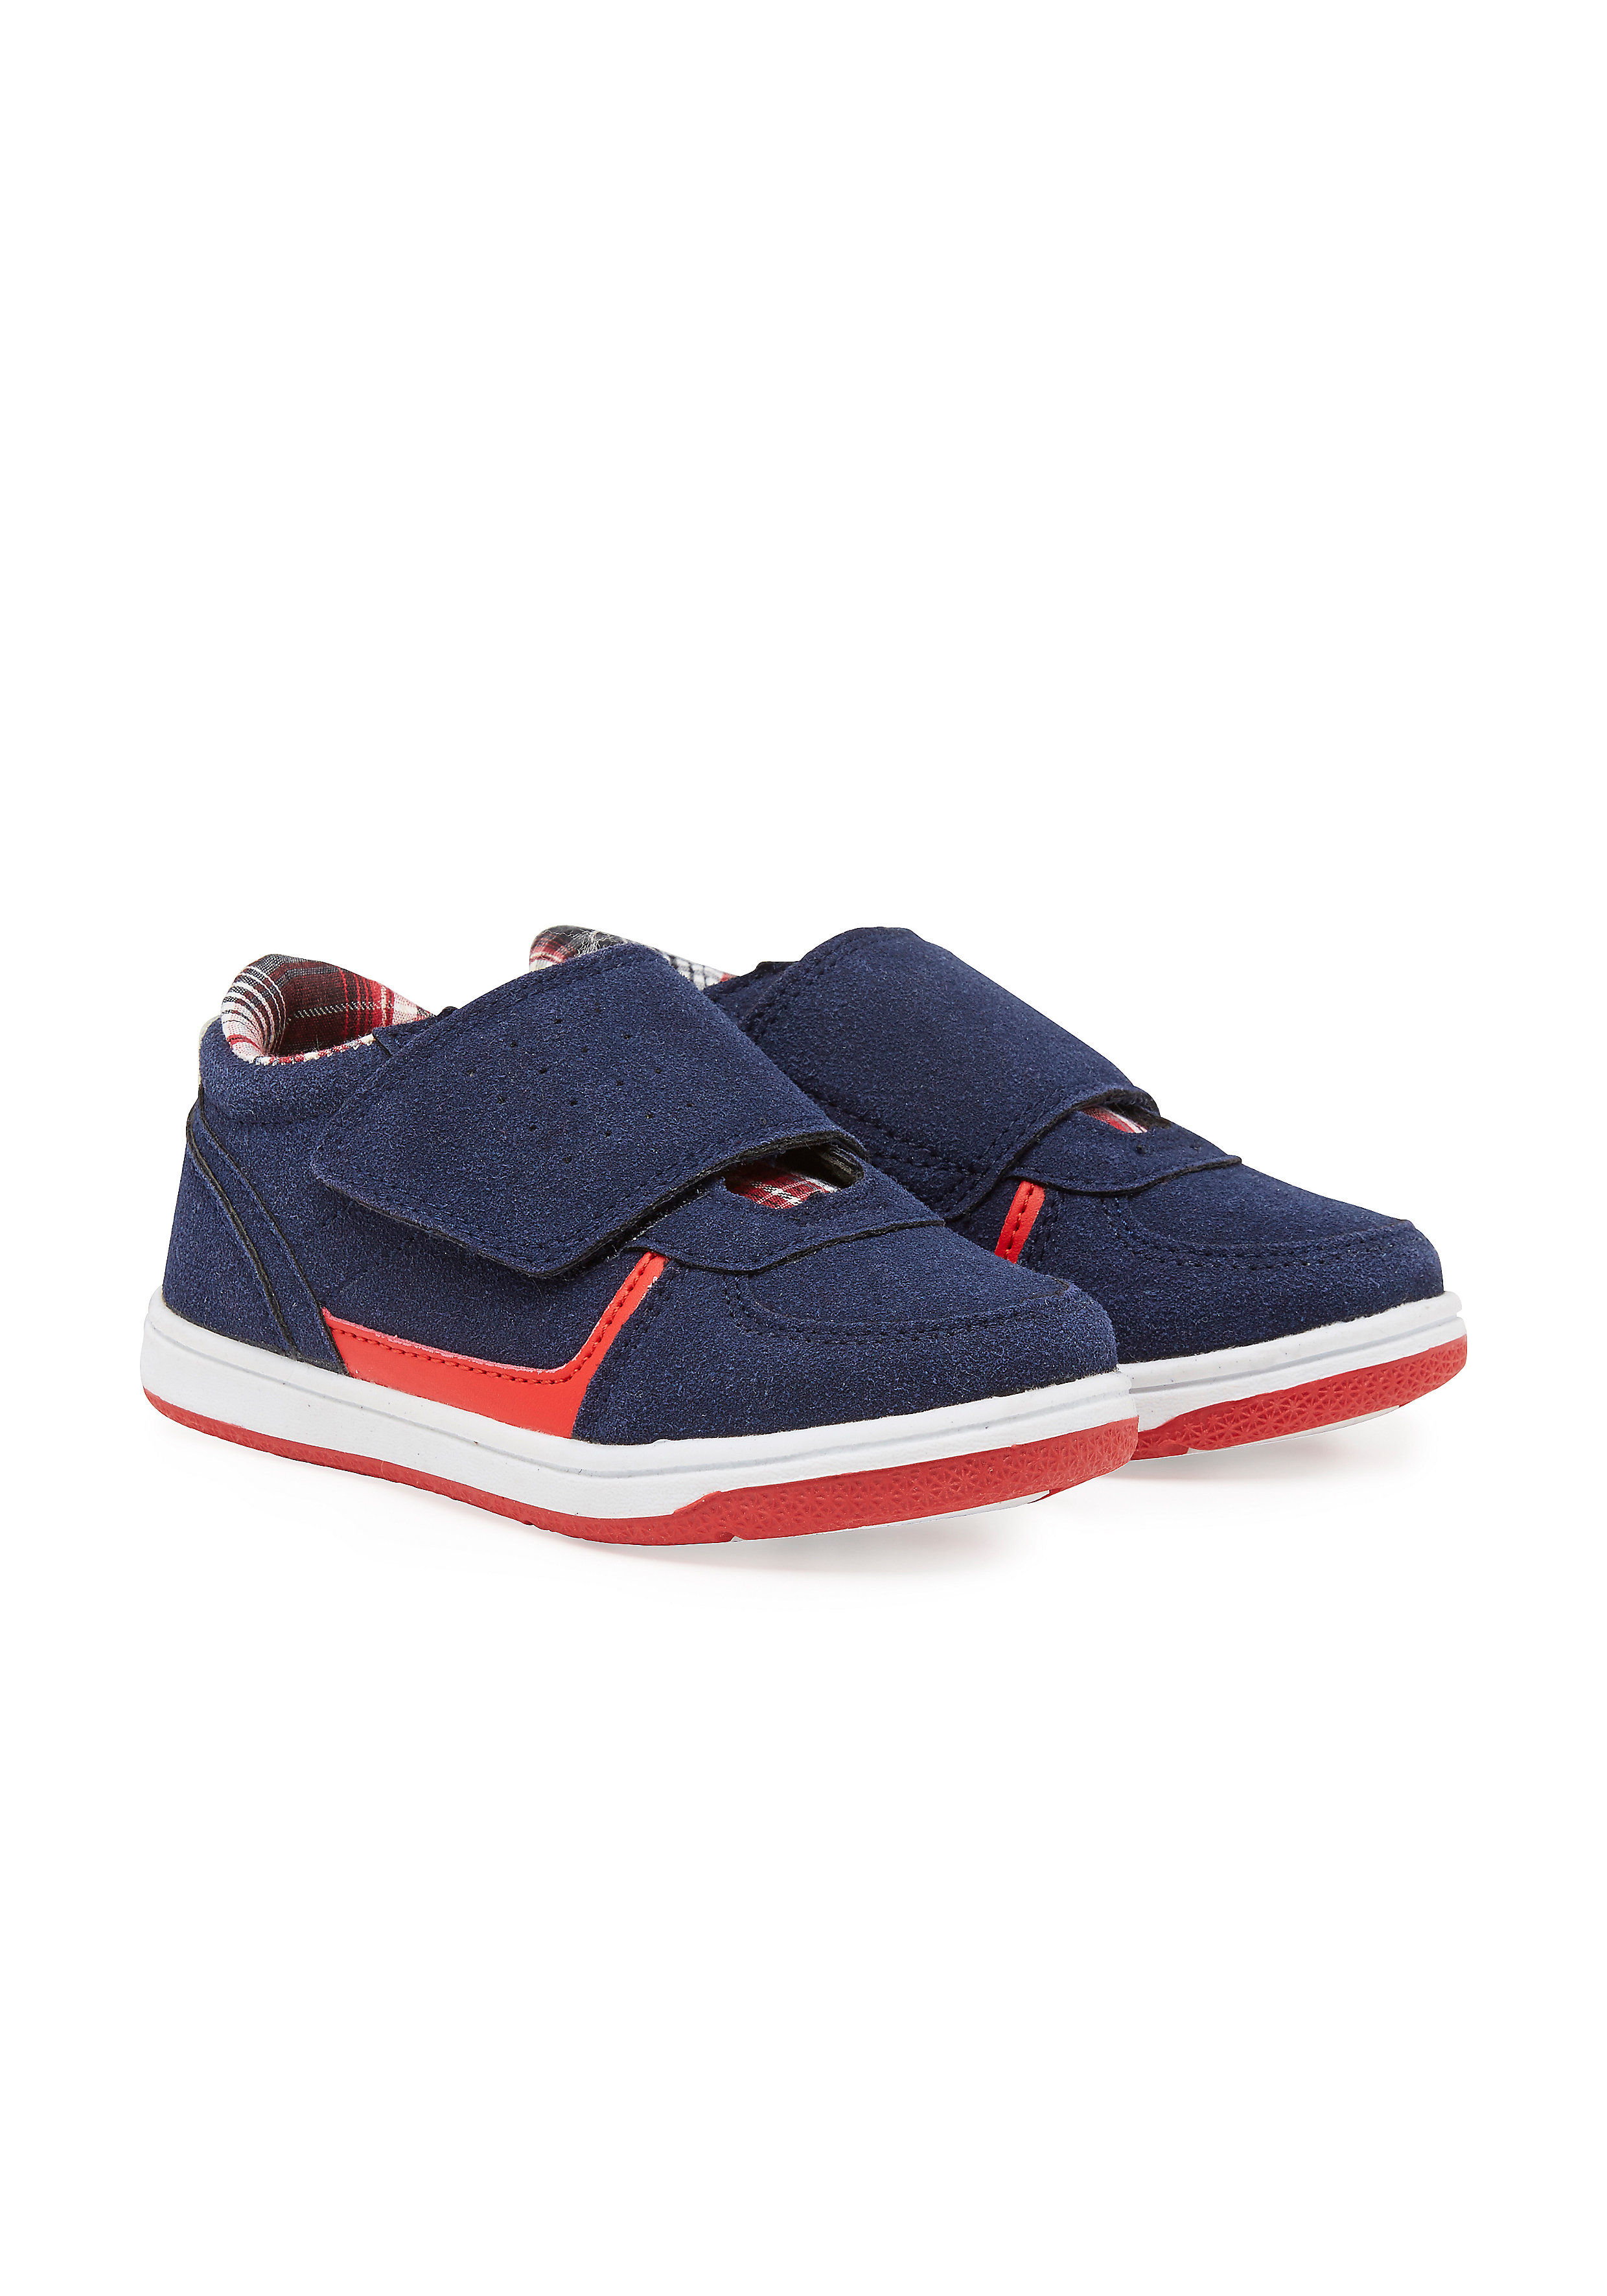 Mothercare | Boys Sports Shoes Checks - Navy